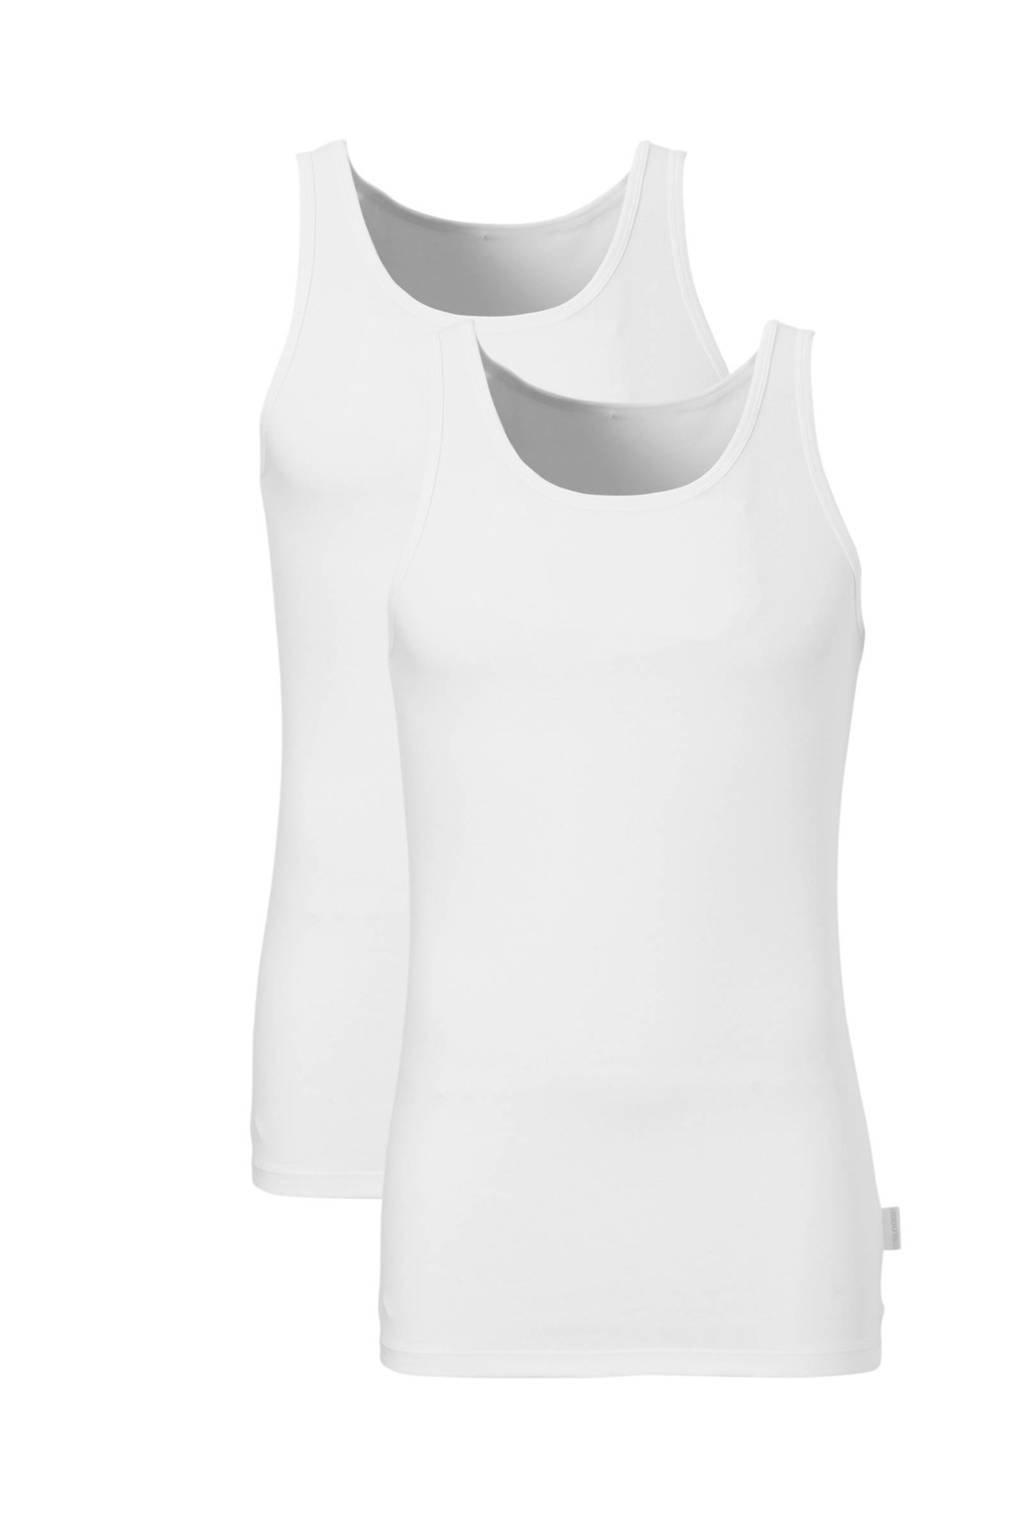 Sloggi Men Basic hemd (set van 2) wit, Wit